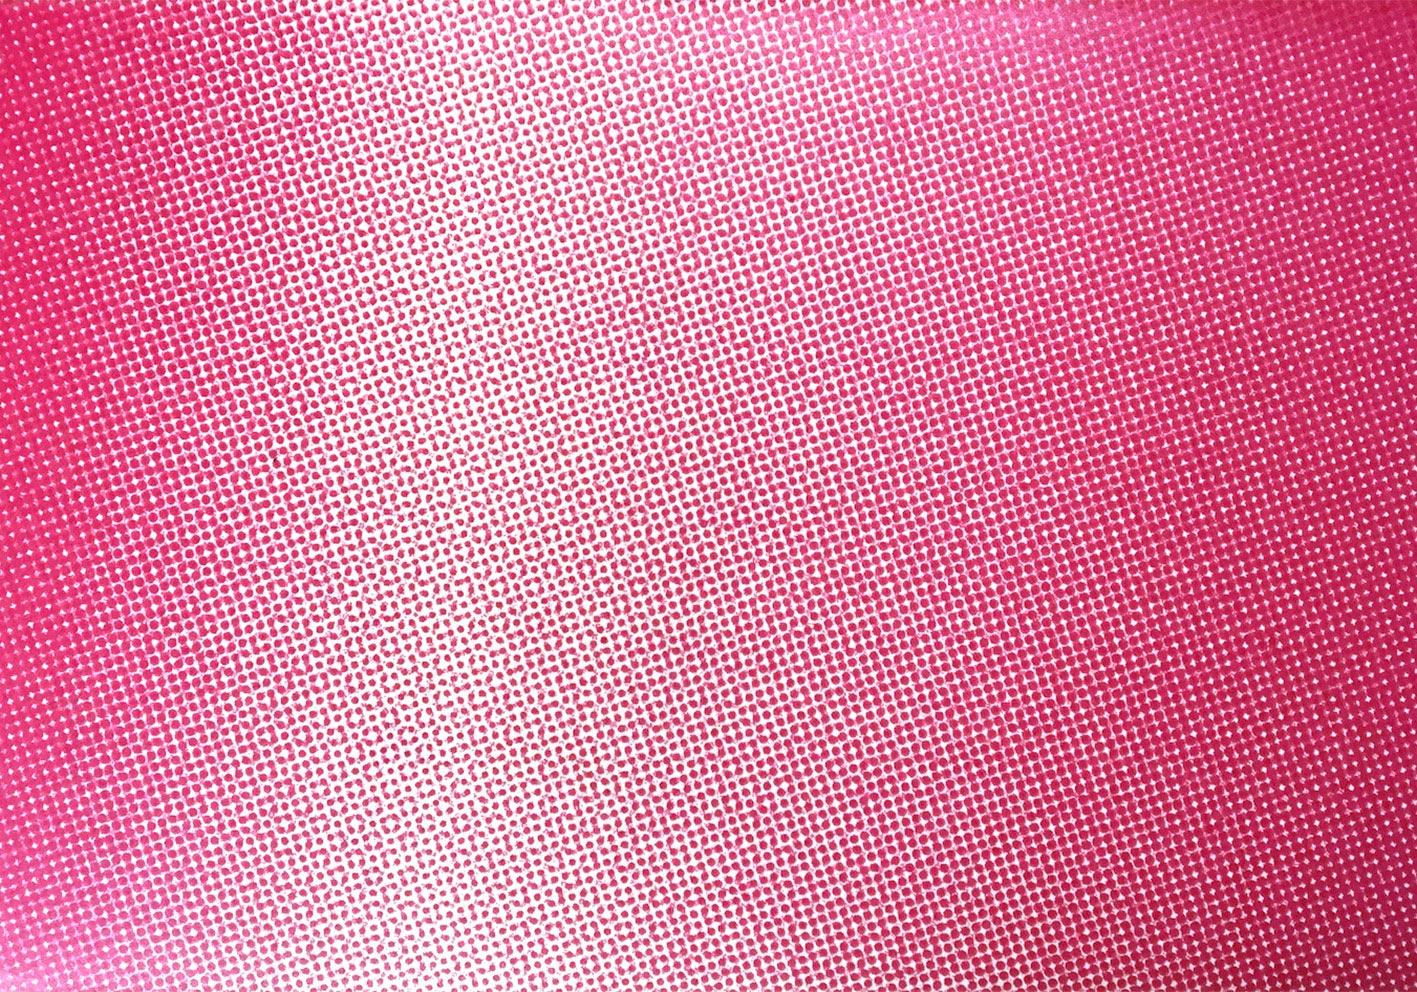 half_tone_gradient 0175w.jpg